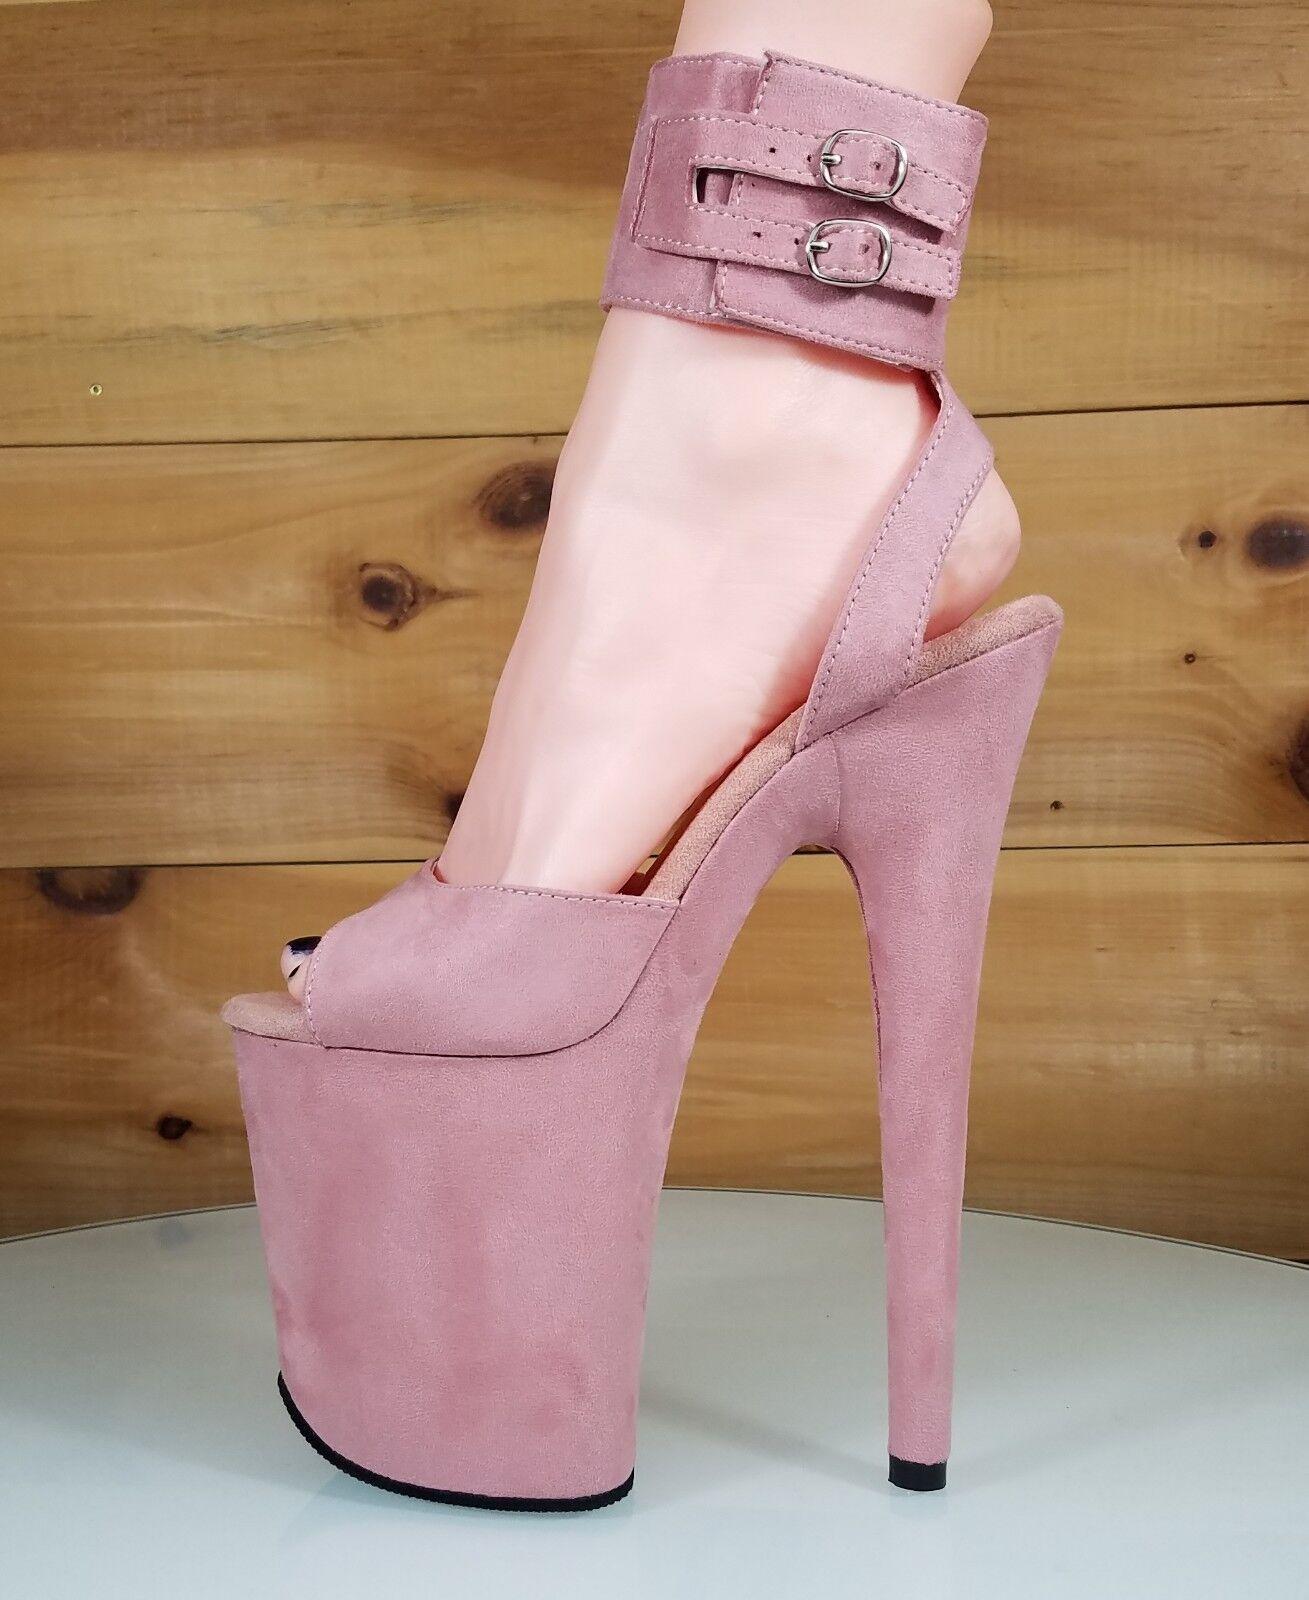 Flamingo 891 891 891 Pink Vegan Suede 8  High Heel Platform shoes Wide Ankle Cuff 6-11 ef8bd2